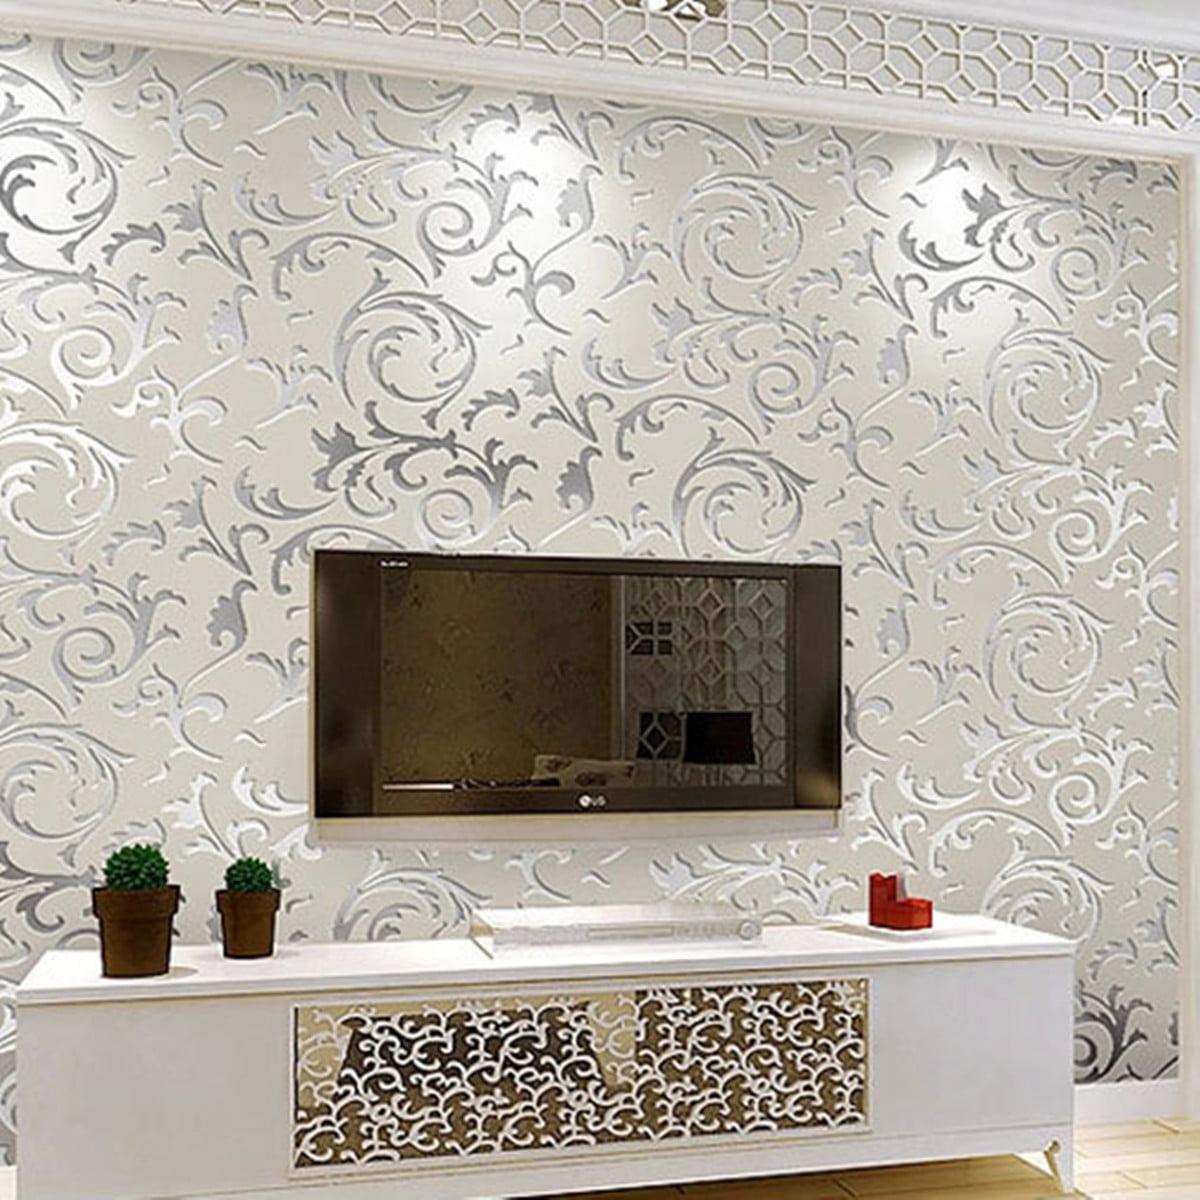 Non Woven 3d Rolls 10m Wallpaper Living Room Bedroom Home Wall Decor Wall Sticker Silver Walmart Canada